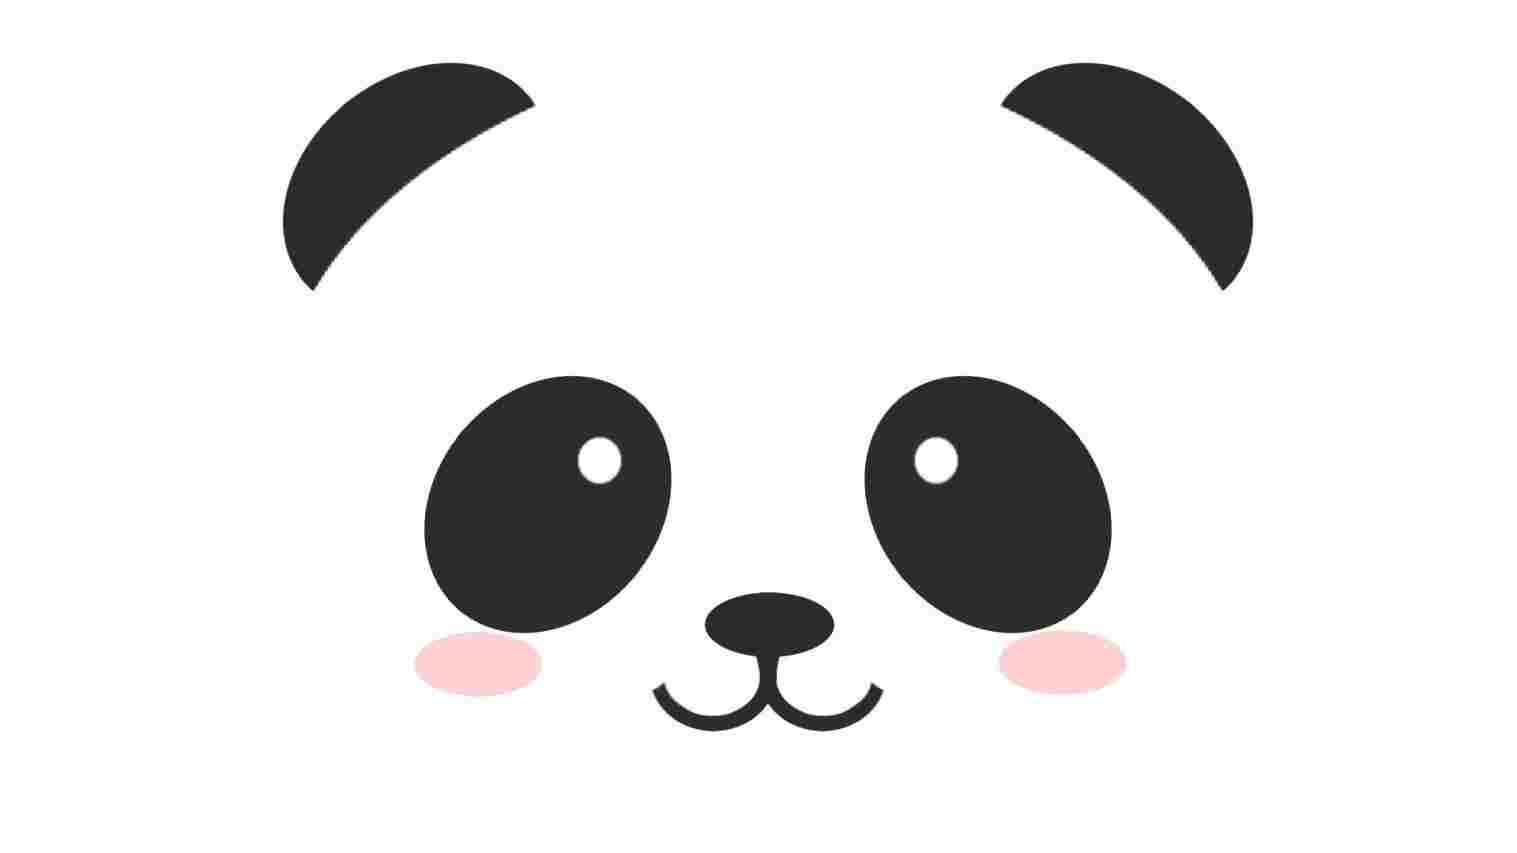 1517x853 Wallpapers Cute Little Panda Drawings Hd Free Download